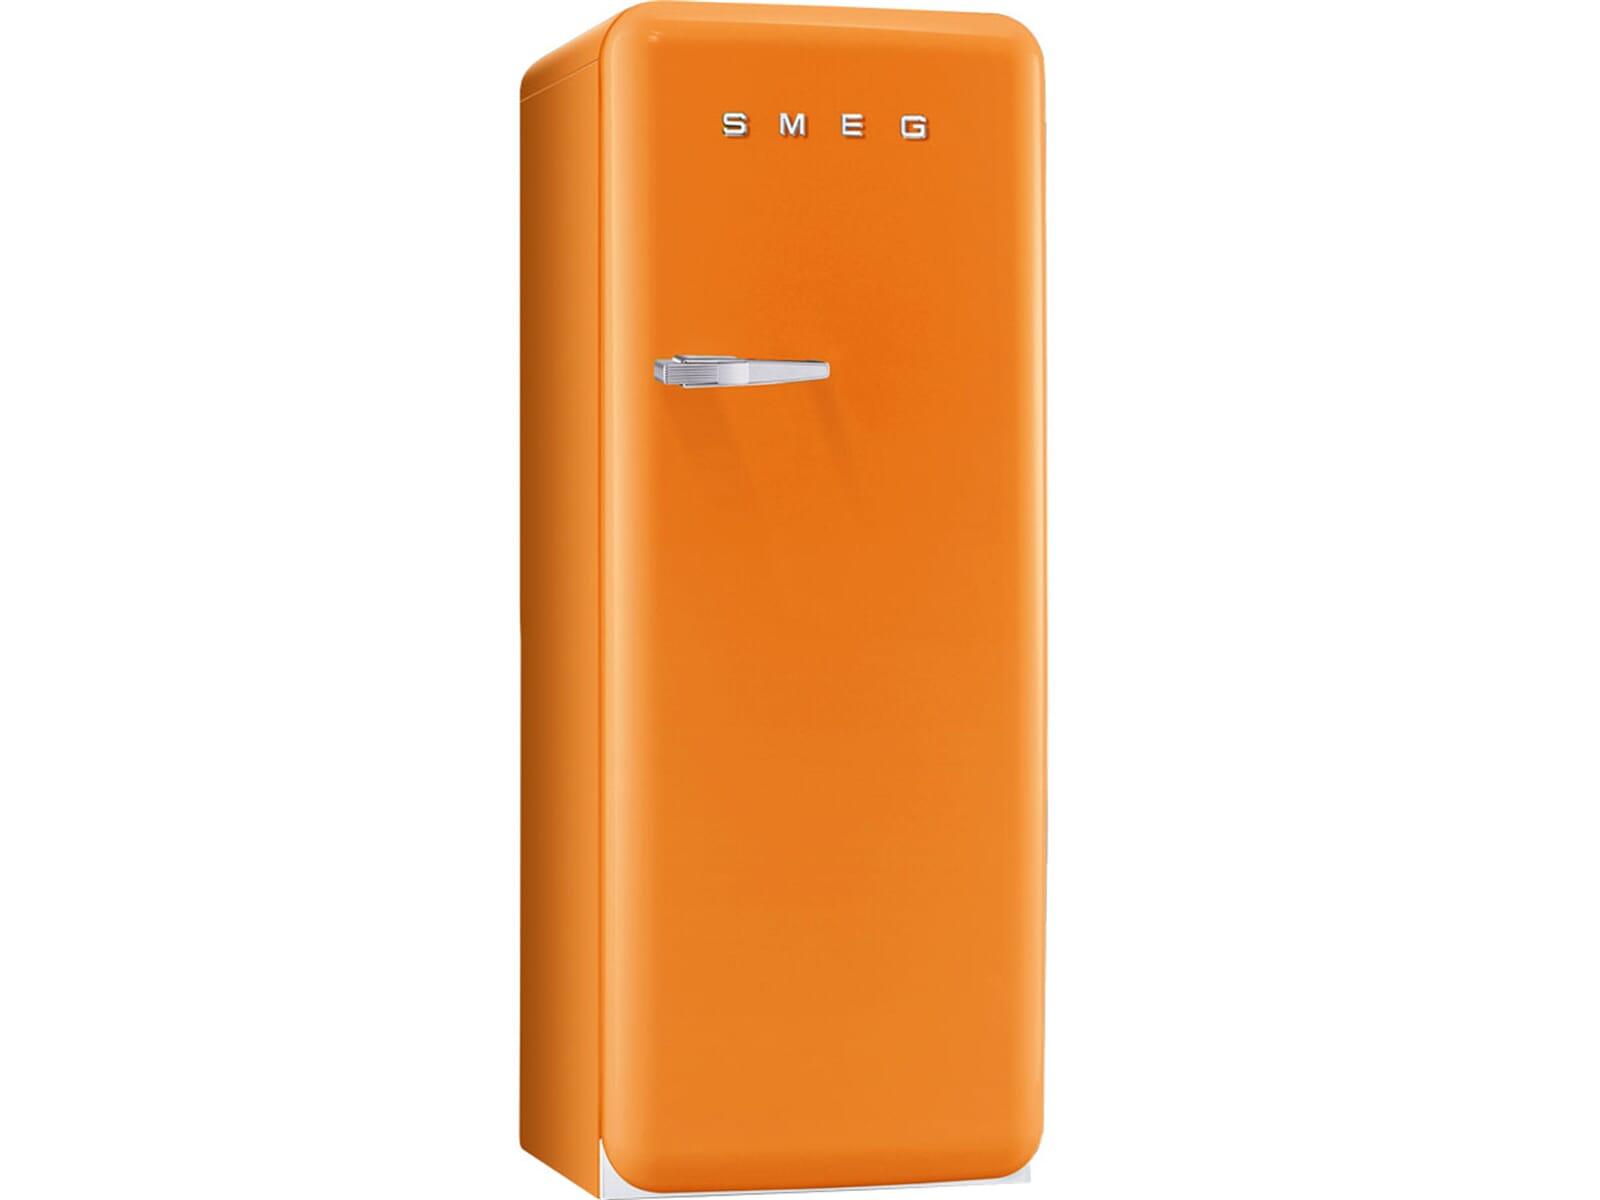 Retro Kühlschrank Orange : Smeg fab ro standkühlschrank orange